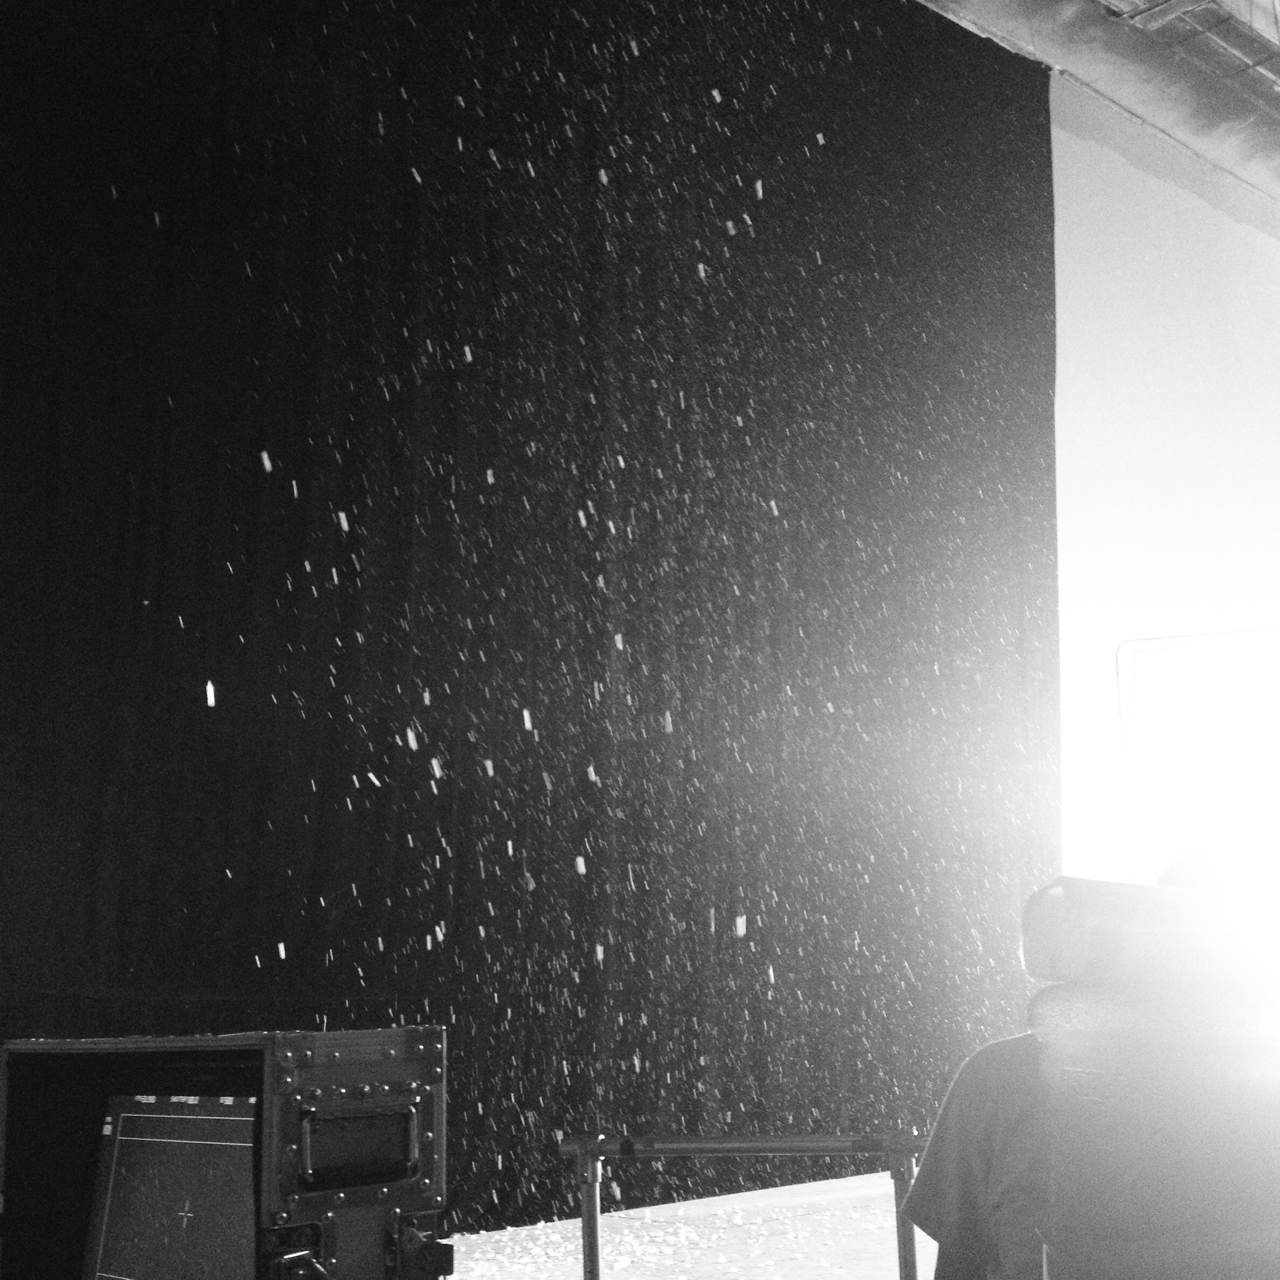 china photo rep, carlos serrao china, quentin shih, quentin shih photographer, quentin shih agent, beijing photo production, beijing video production, production house beijing, production house shanghai, beijing eye,